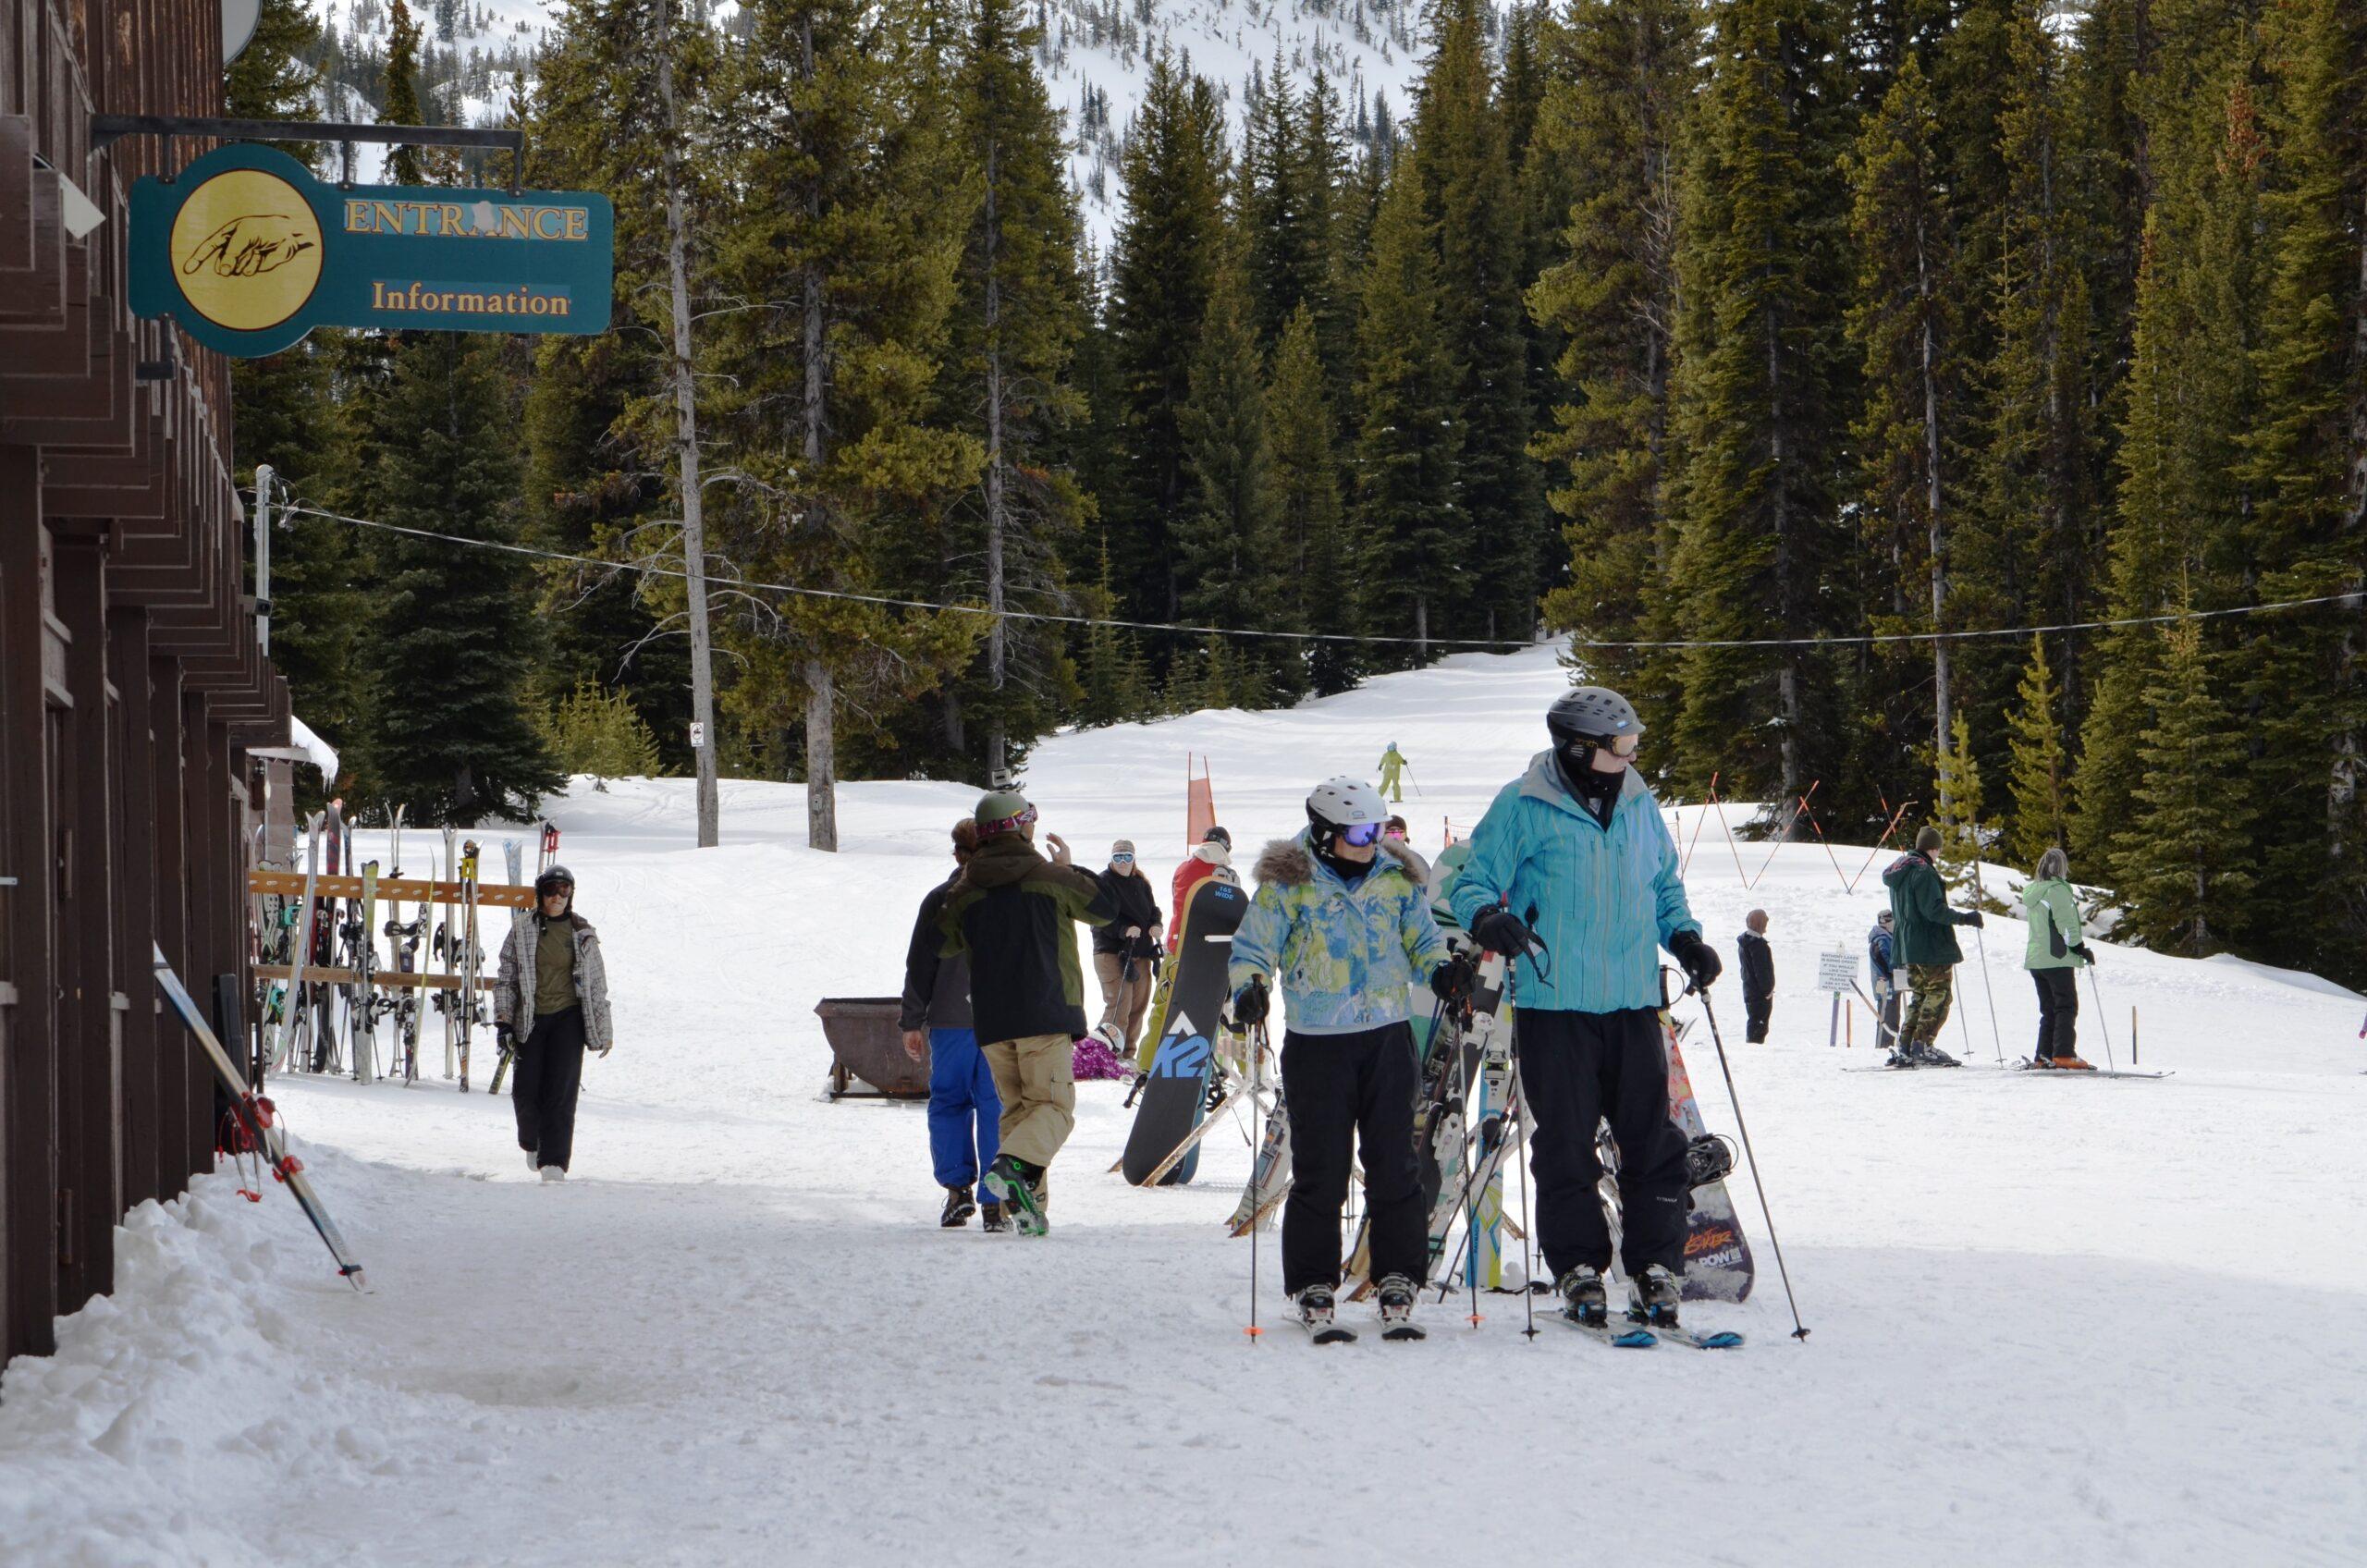 skiing-snowboarding-nordic-06